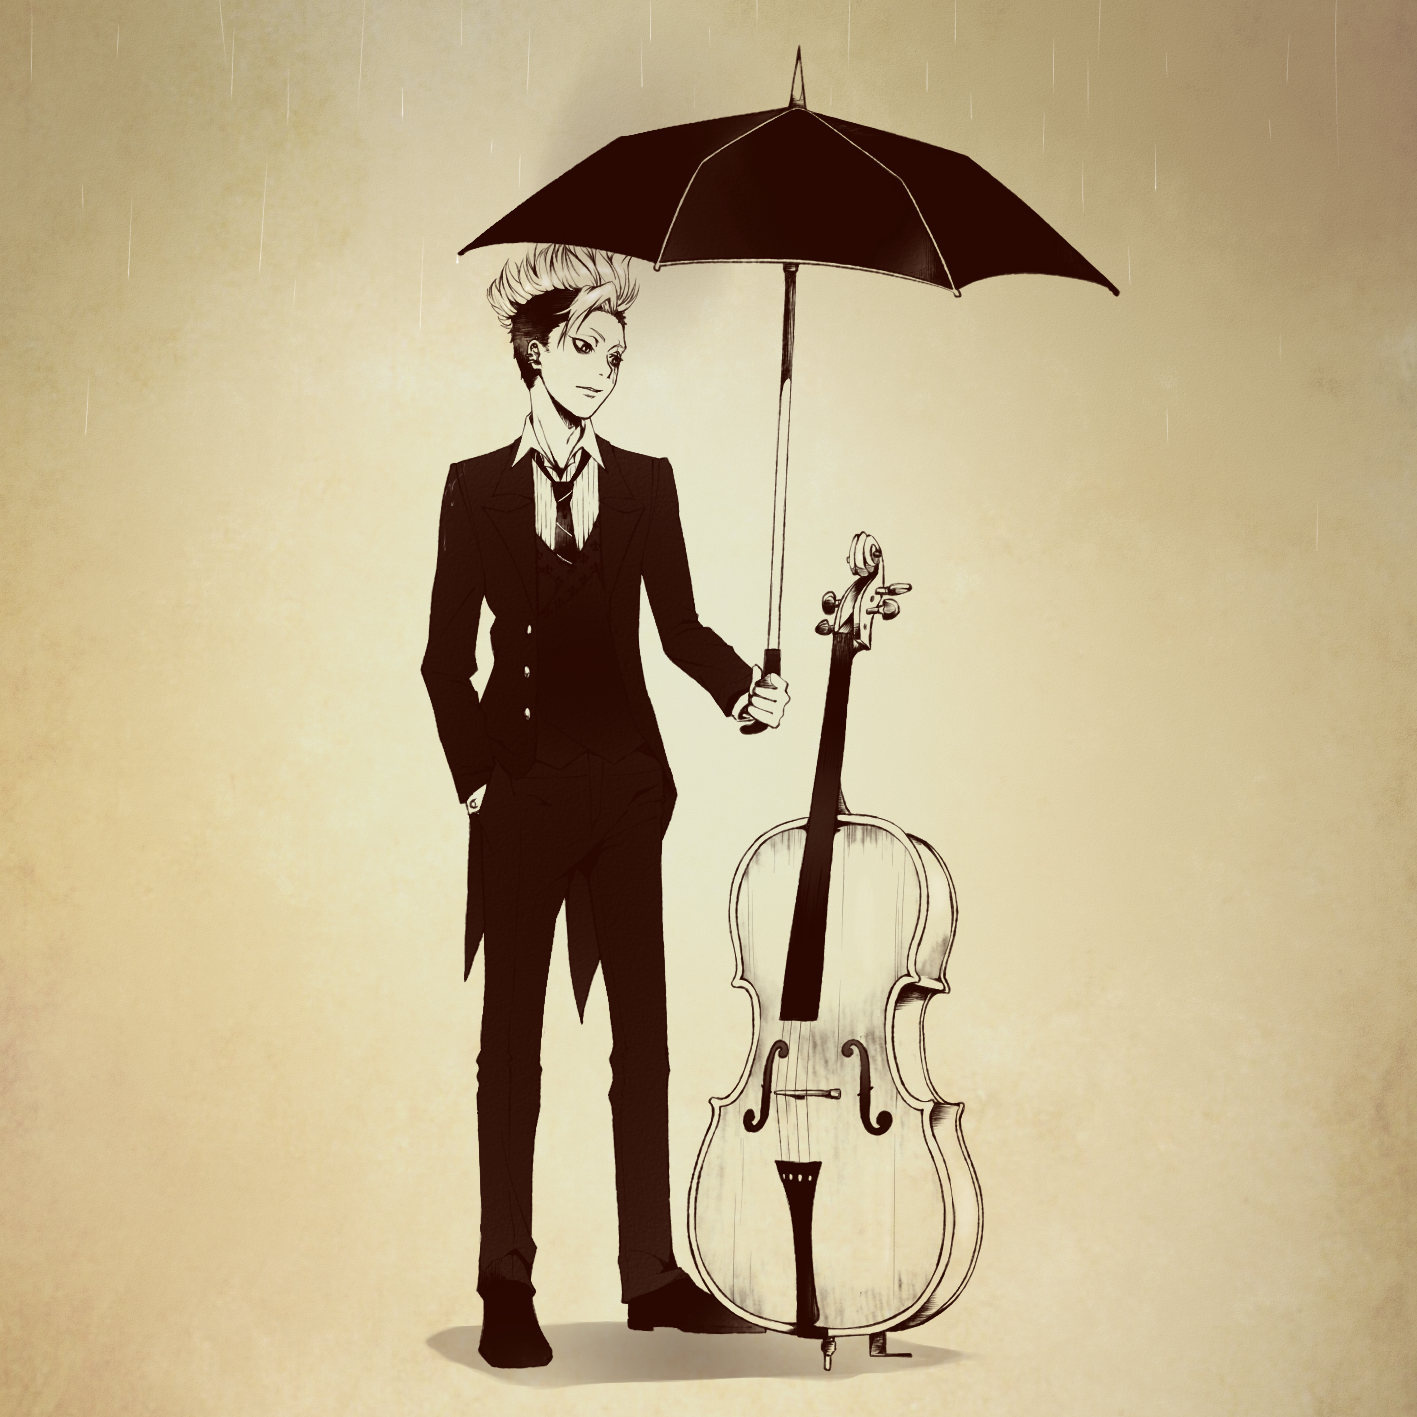 Cello by Gurvana